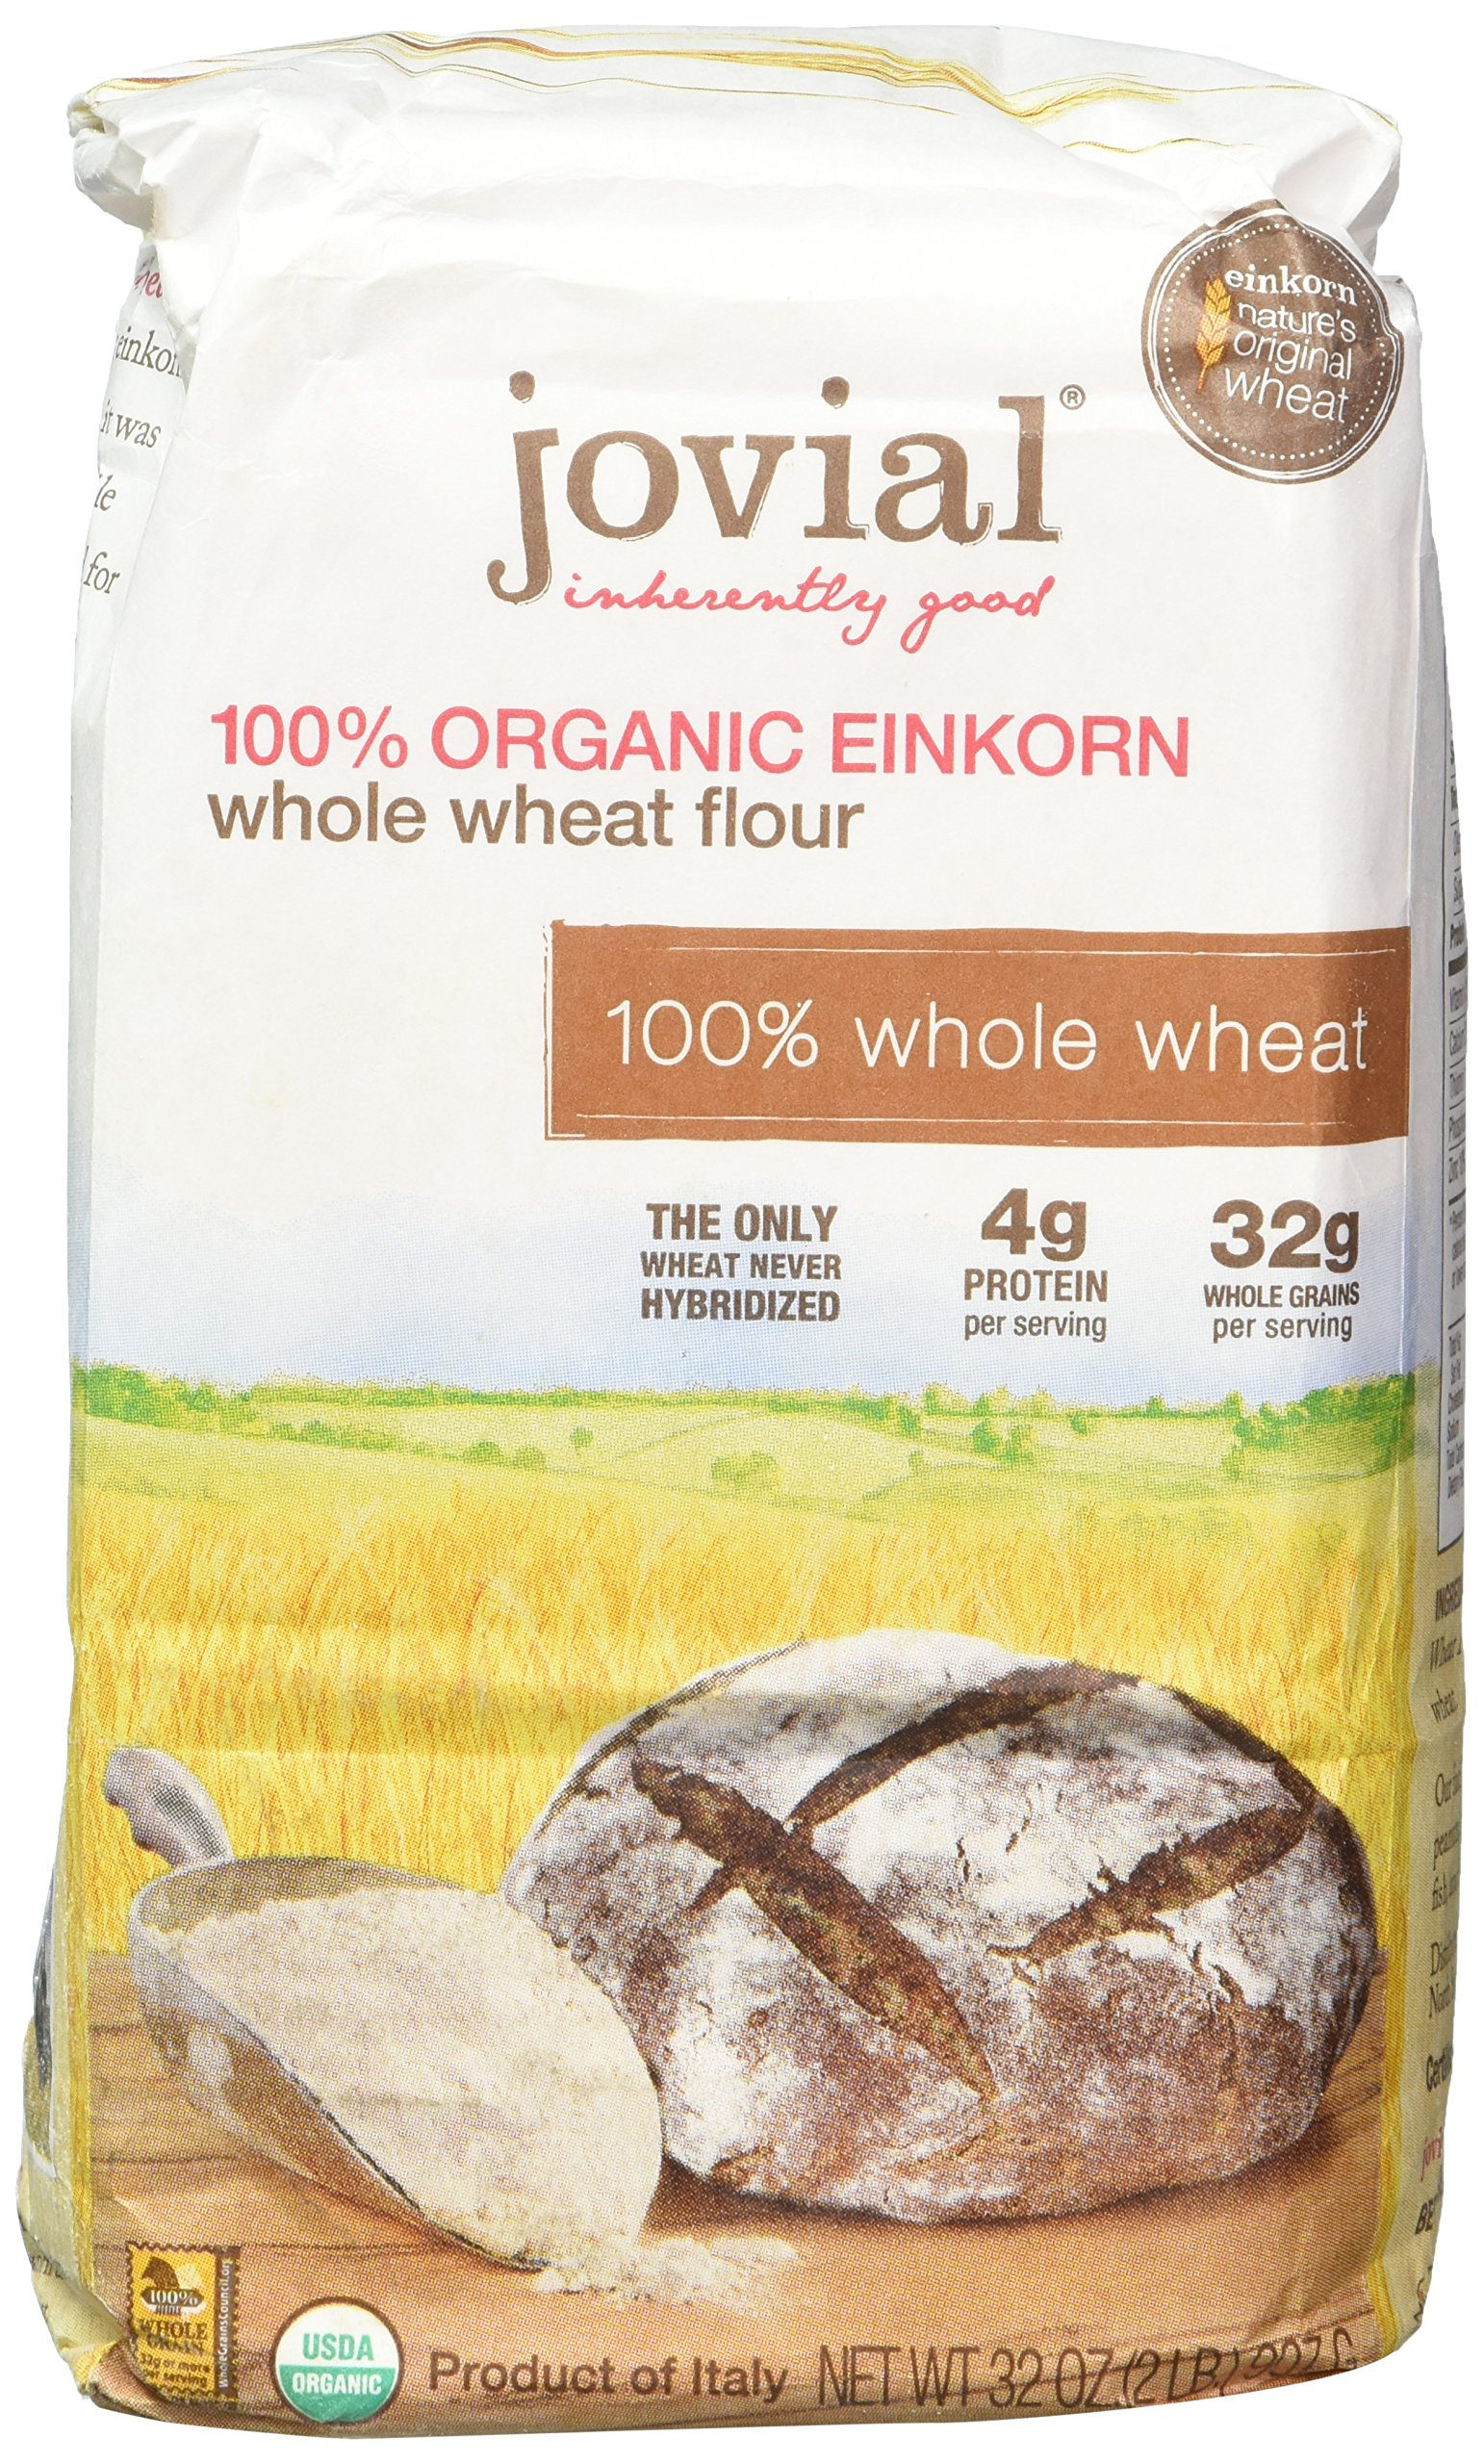 Jovial 100% Organic Einkorn Whole Wheat Flour 32oz by Jovial